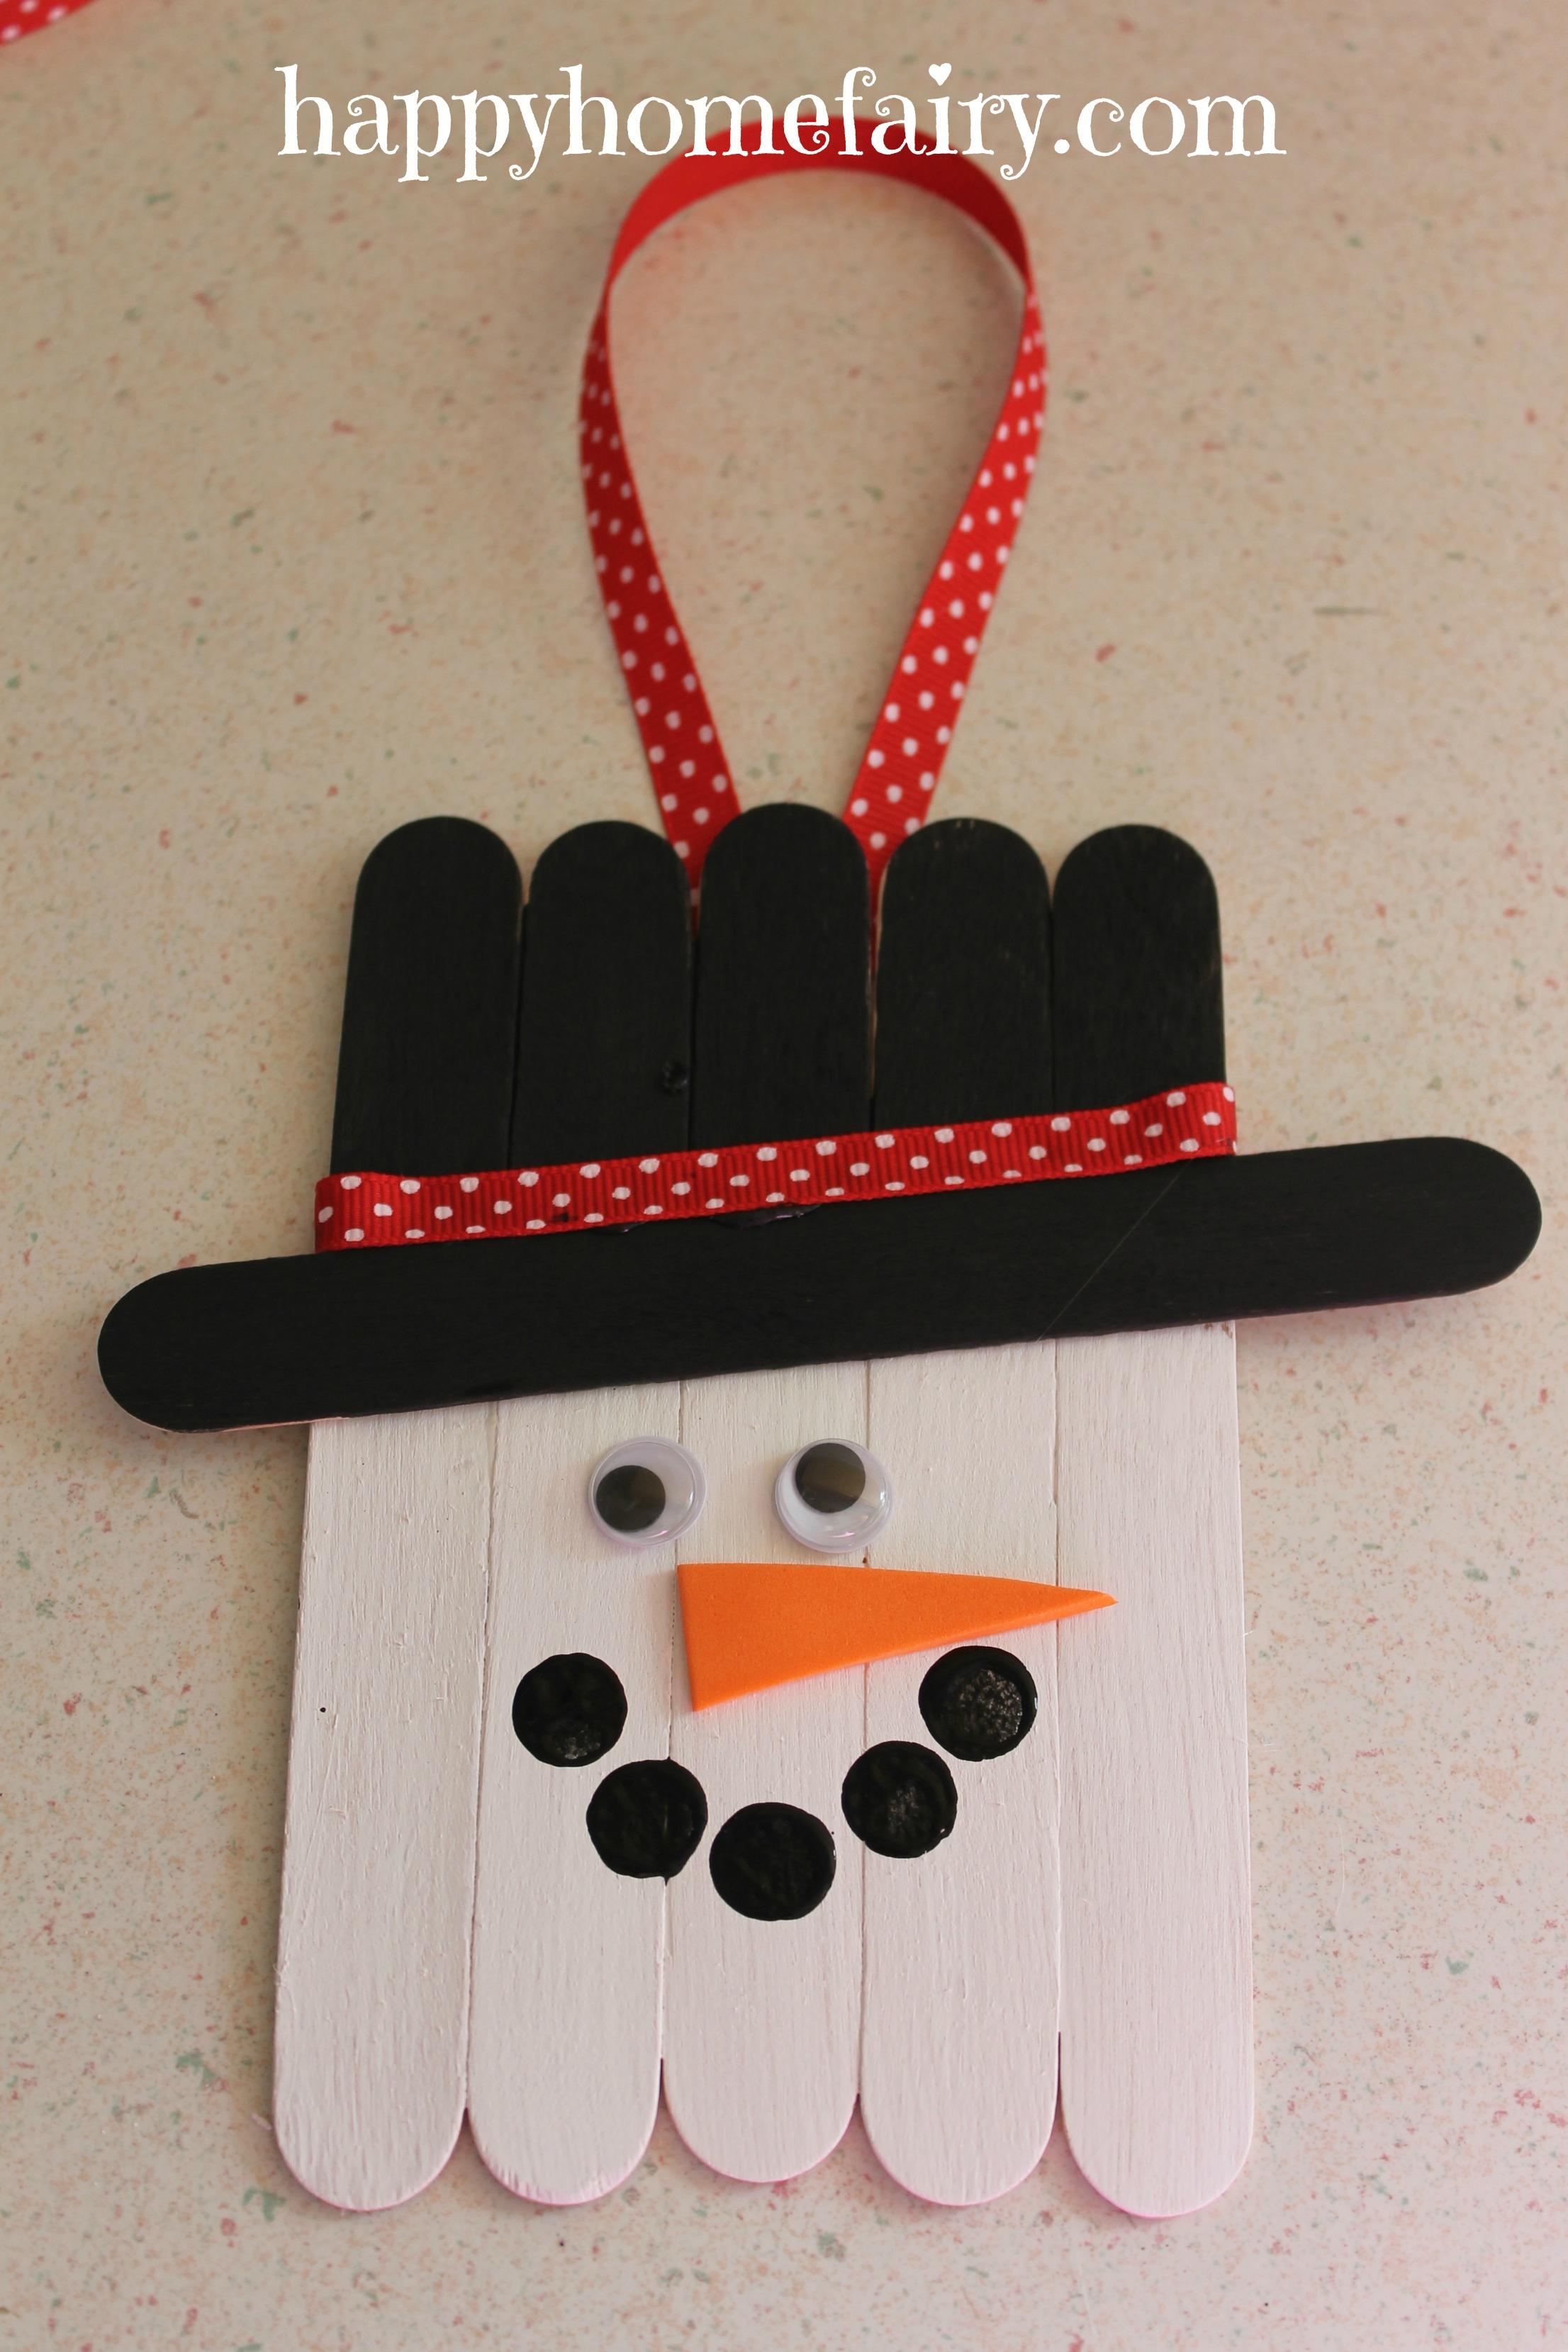 Craft Ideas Using Ribbon